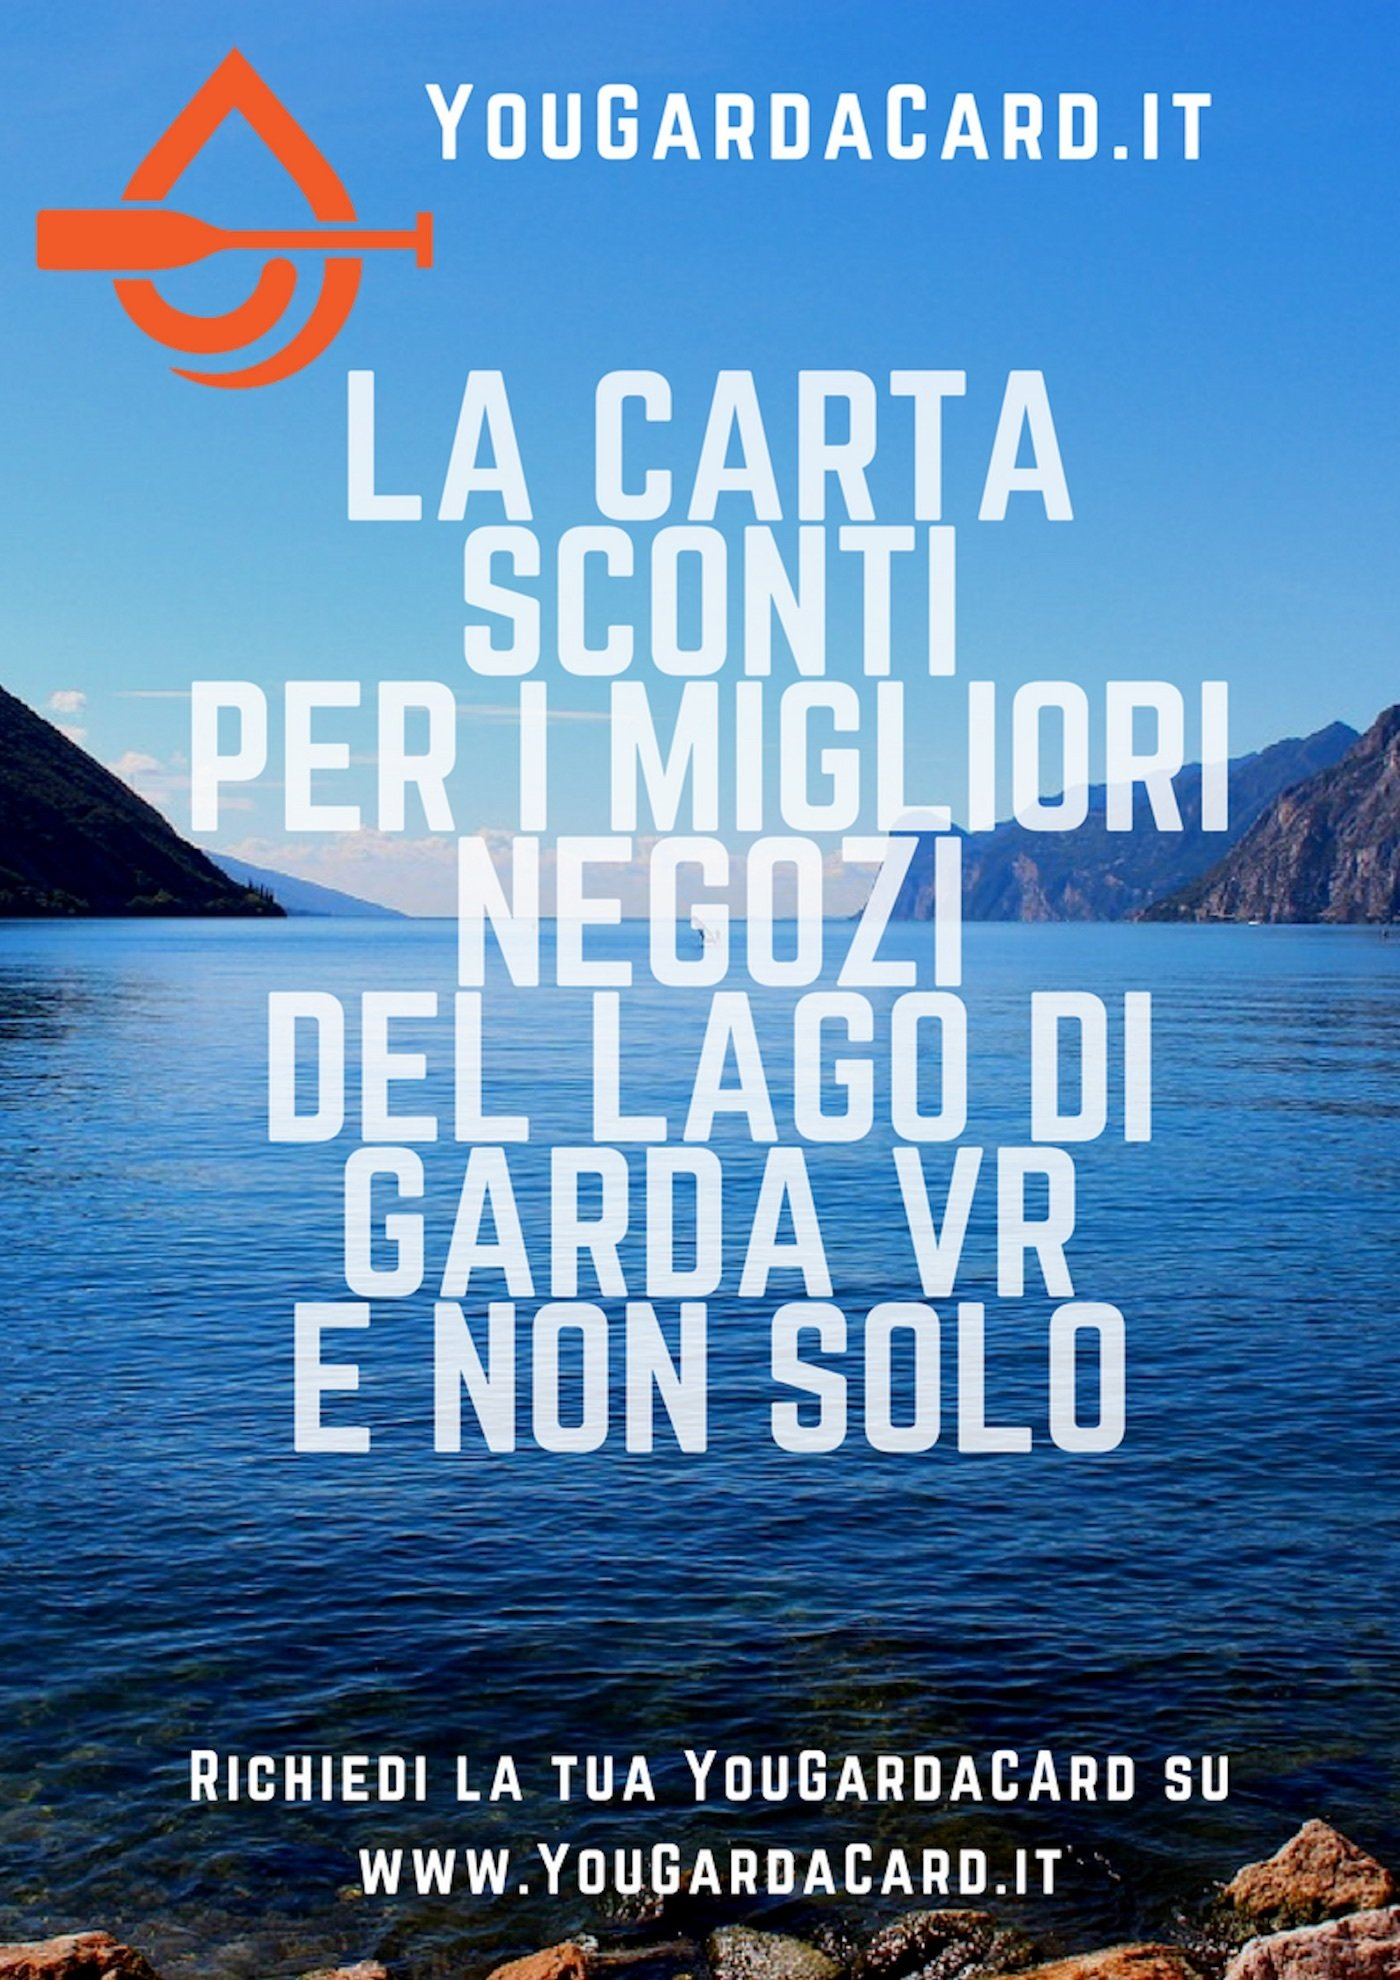 YouGardaCard - Sconti  sul Lago di Garda garda01a